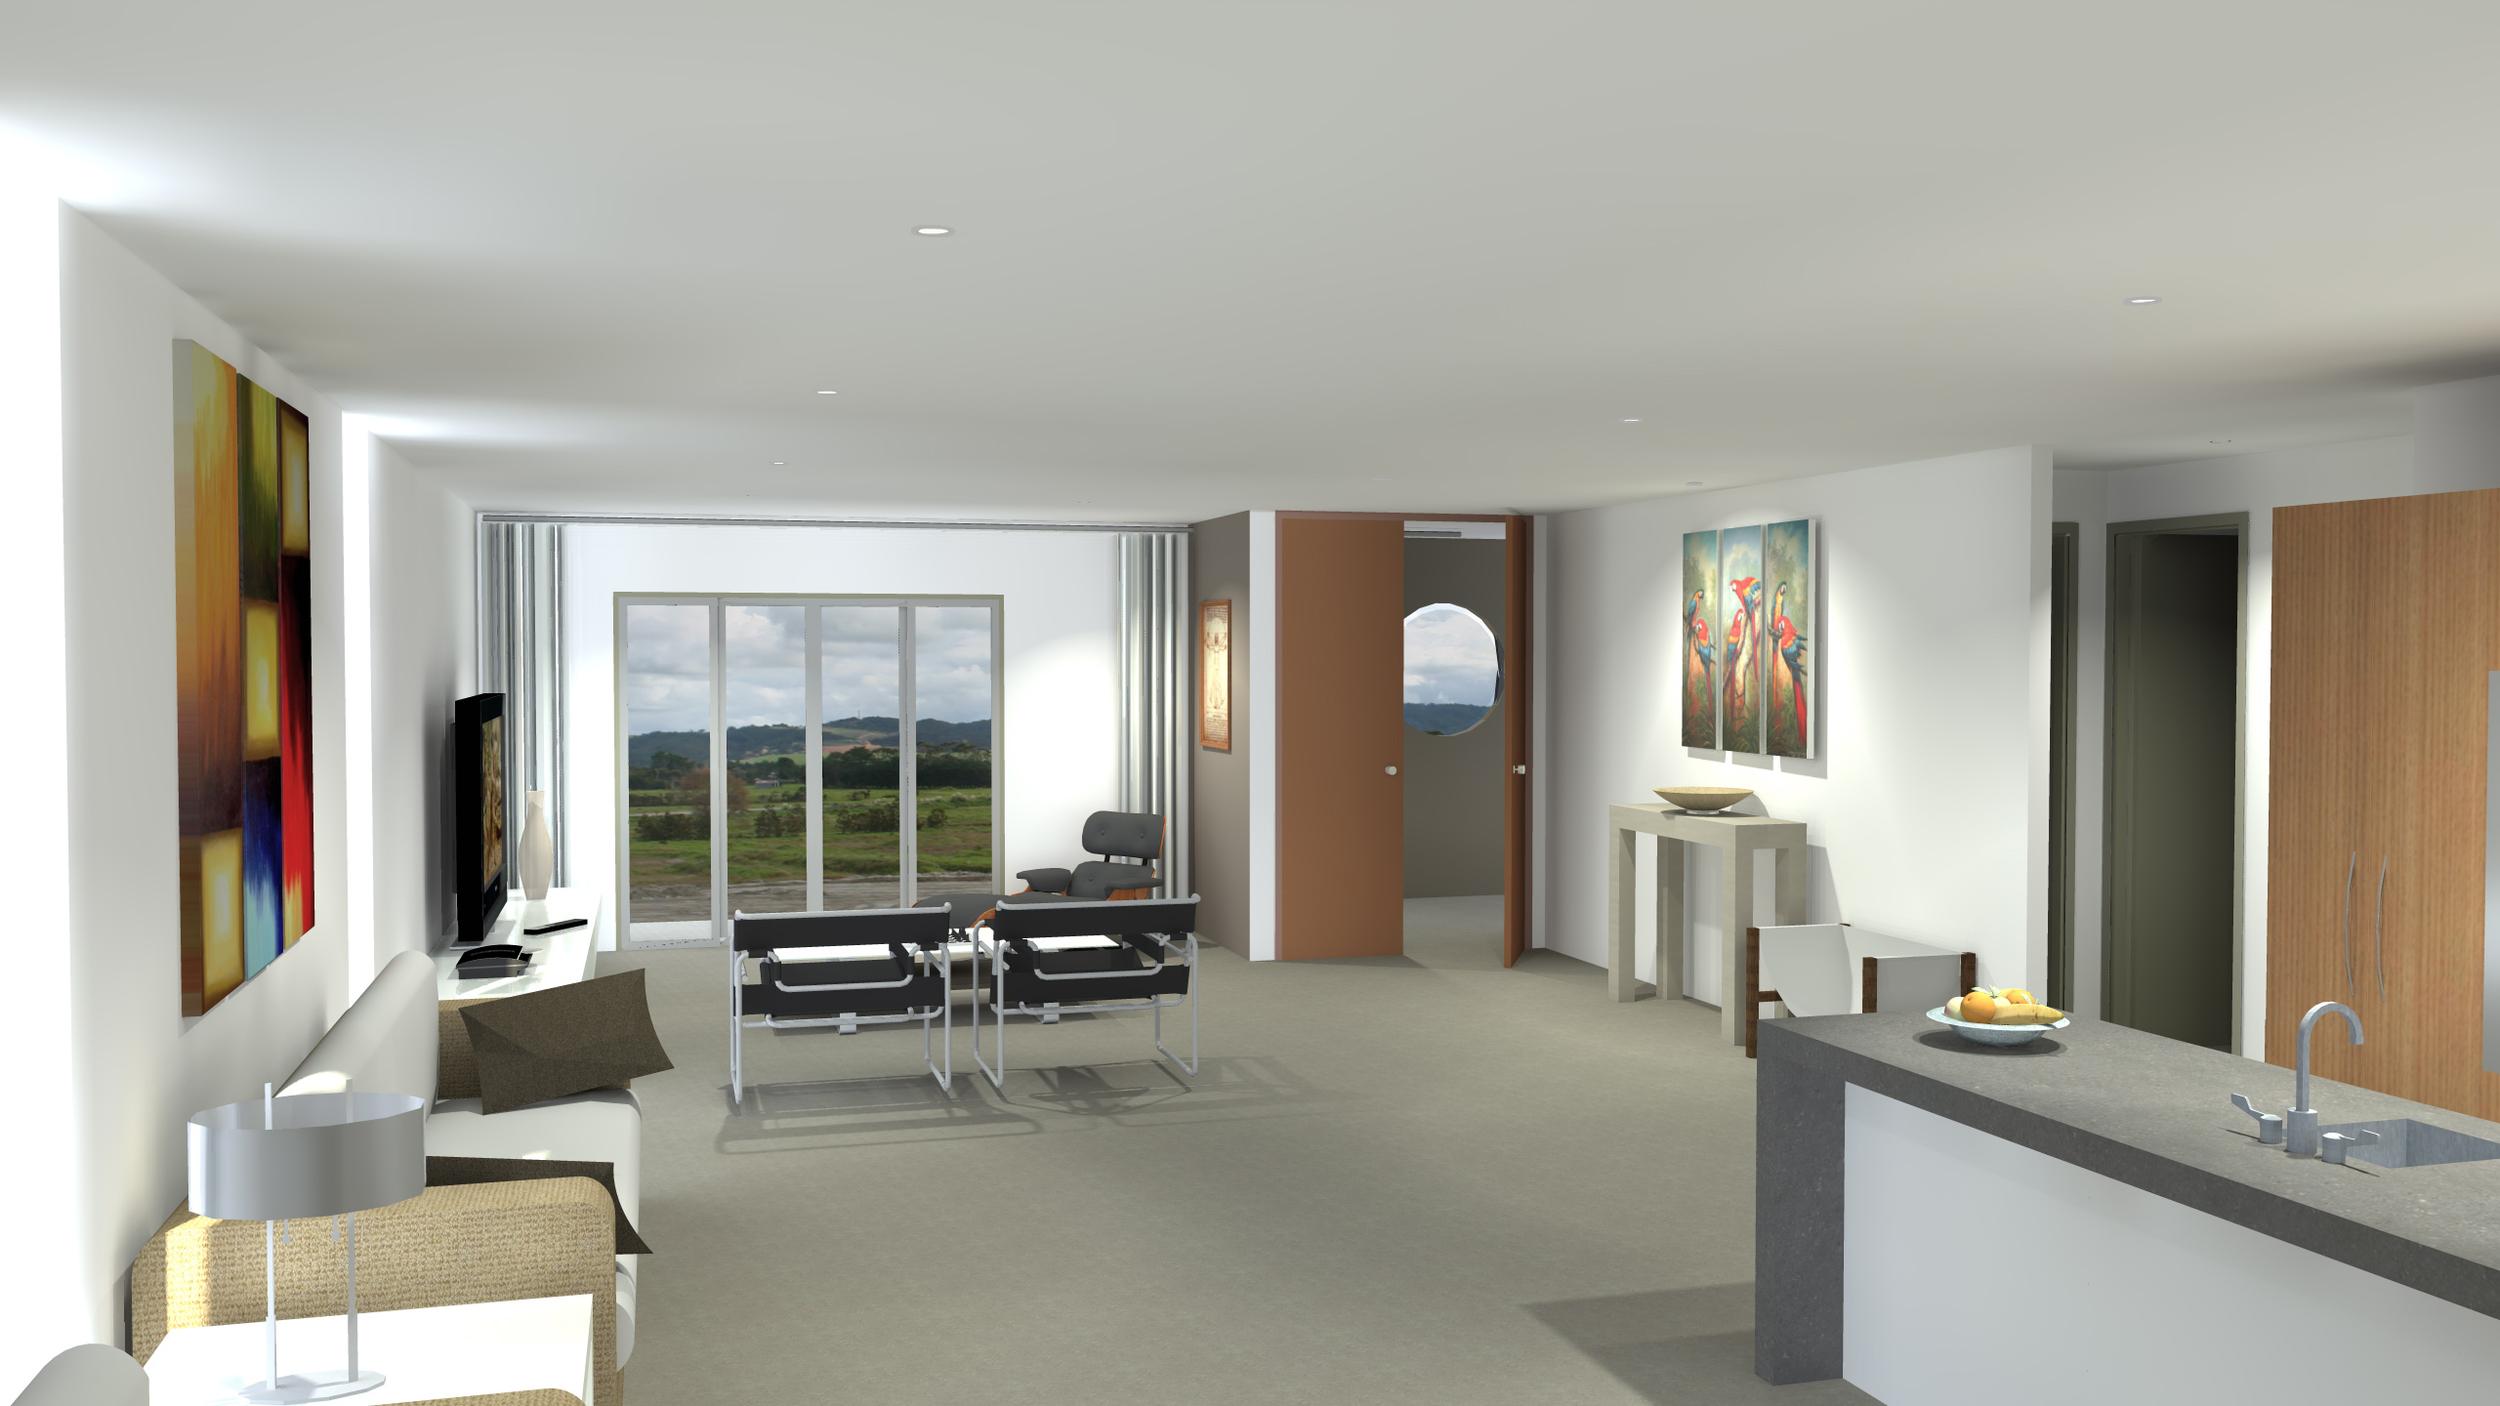 Apartment Image 3.jpg